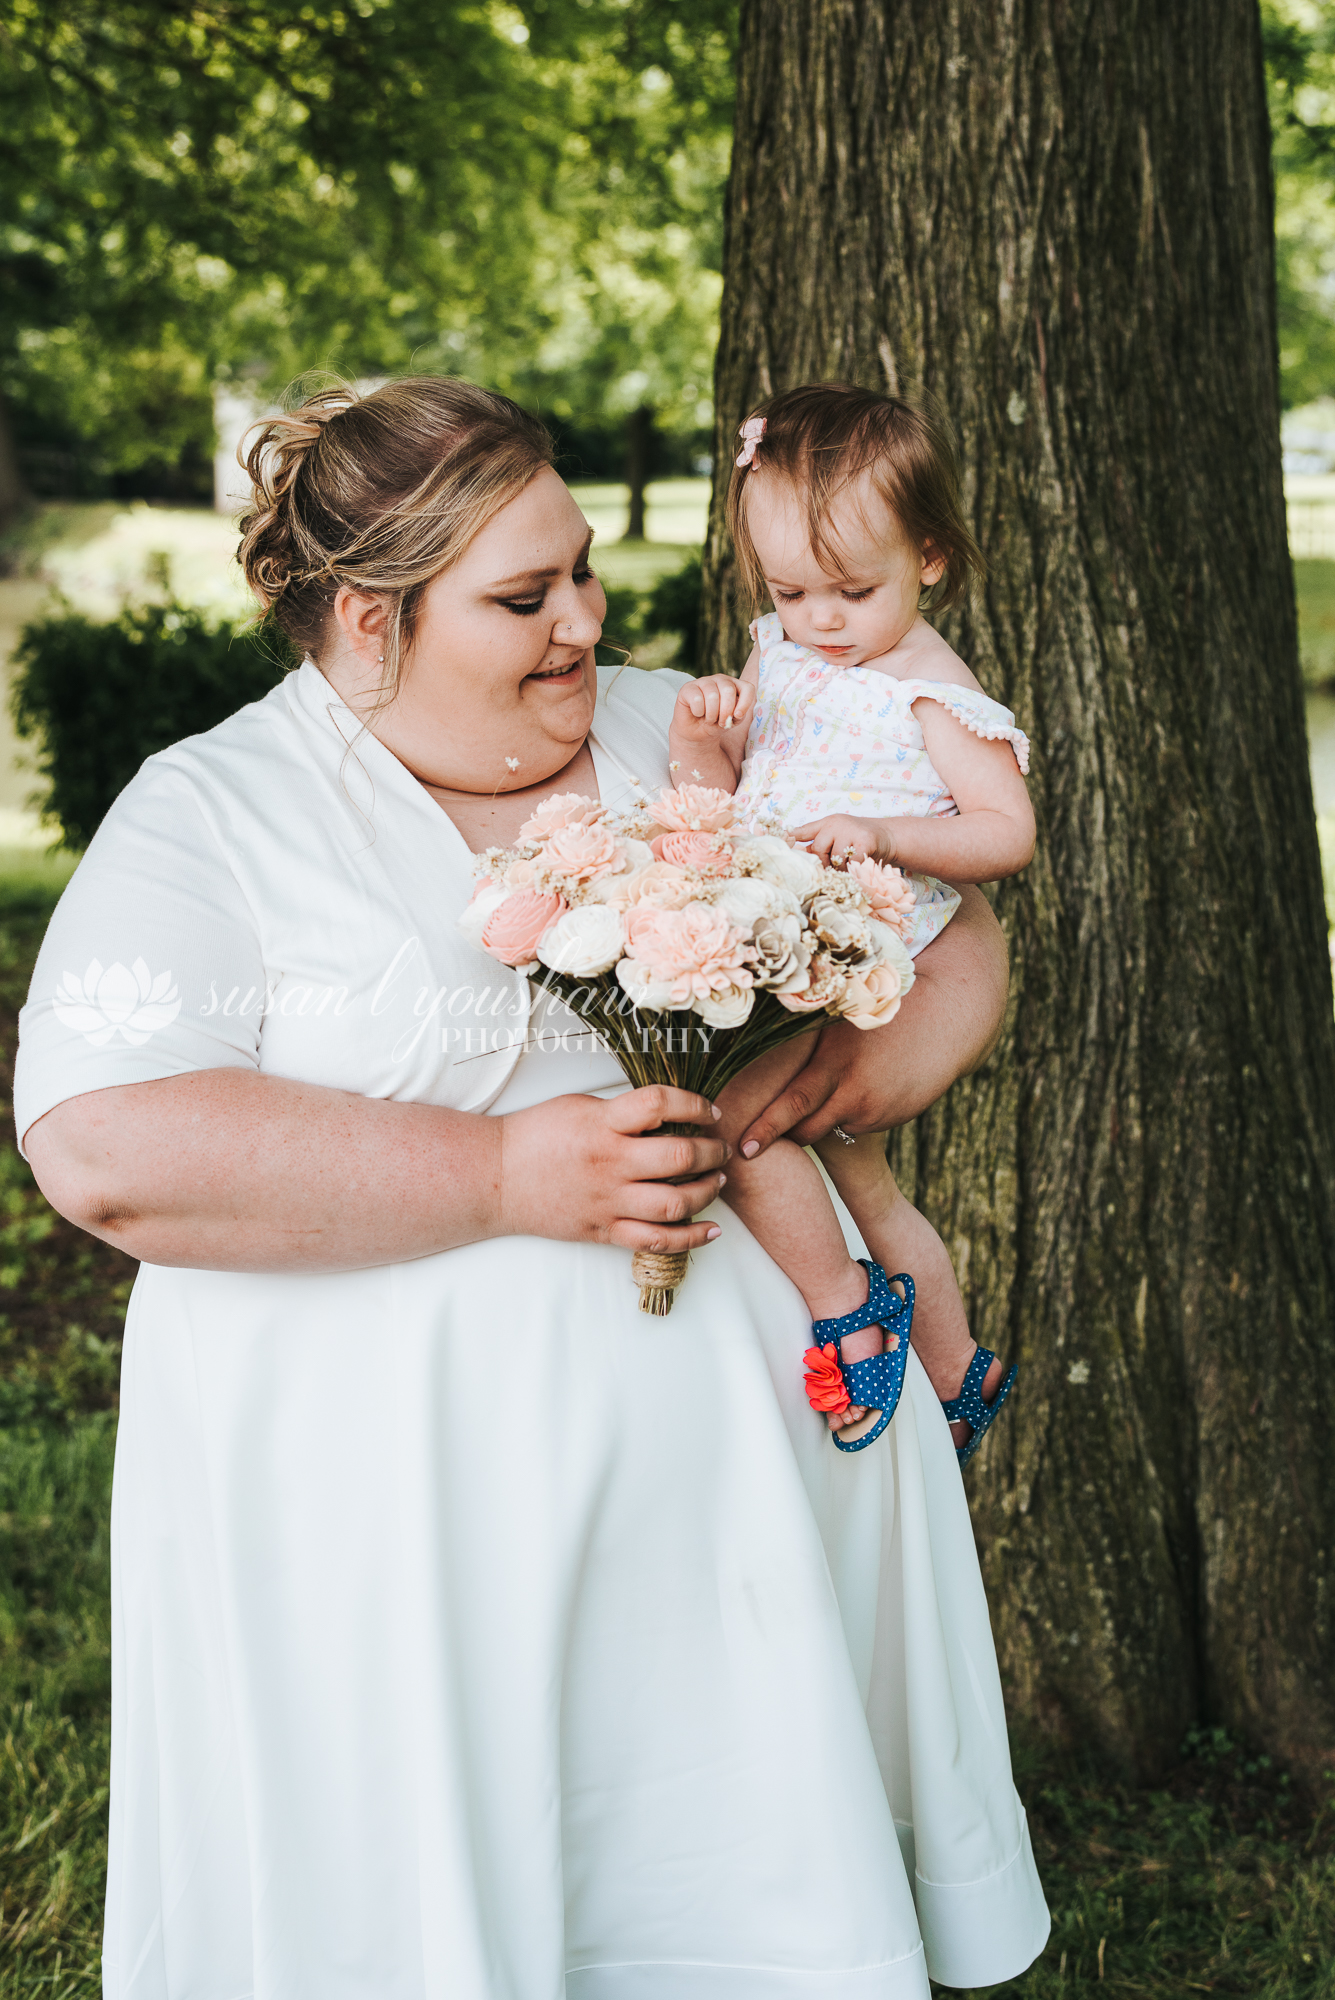 Bill and Sarah Wedding Photos 06-08-2019 SLY Photography -46.jpg